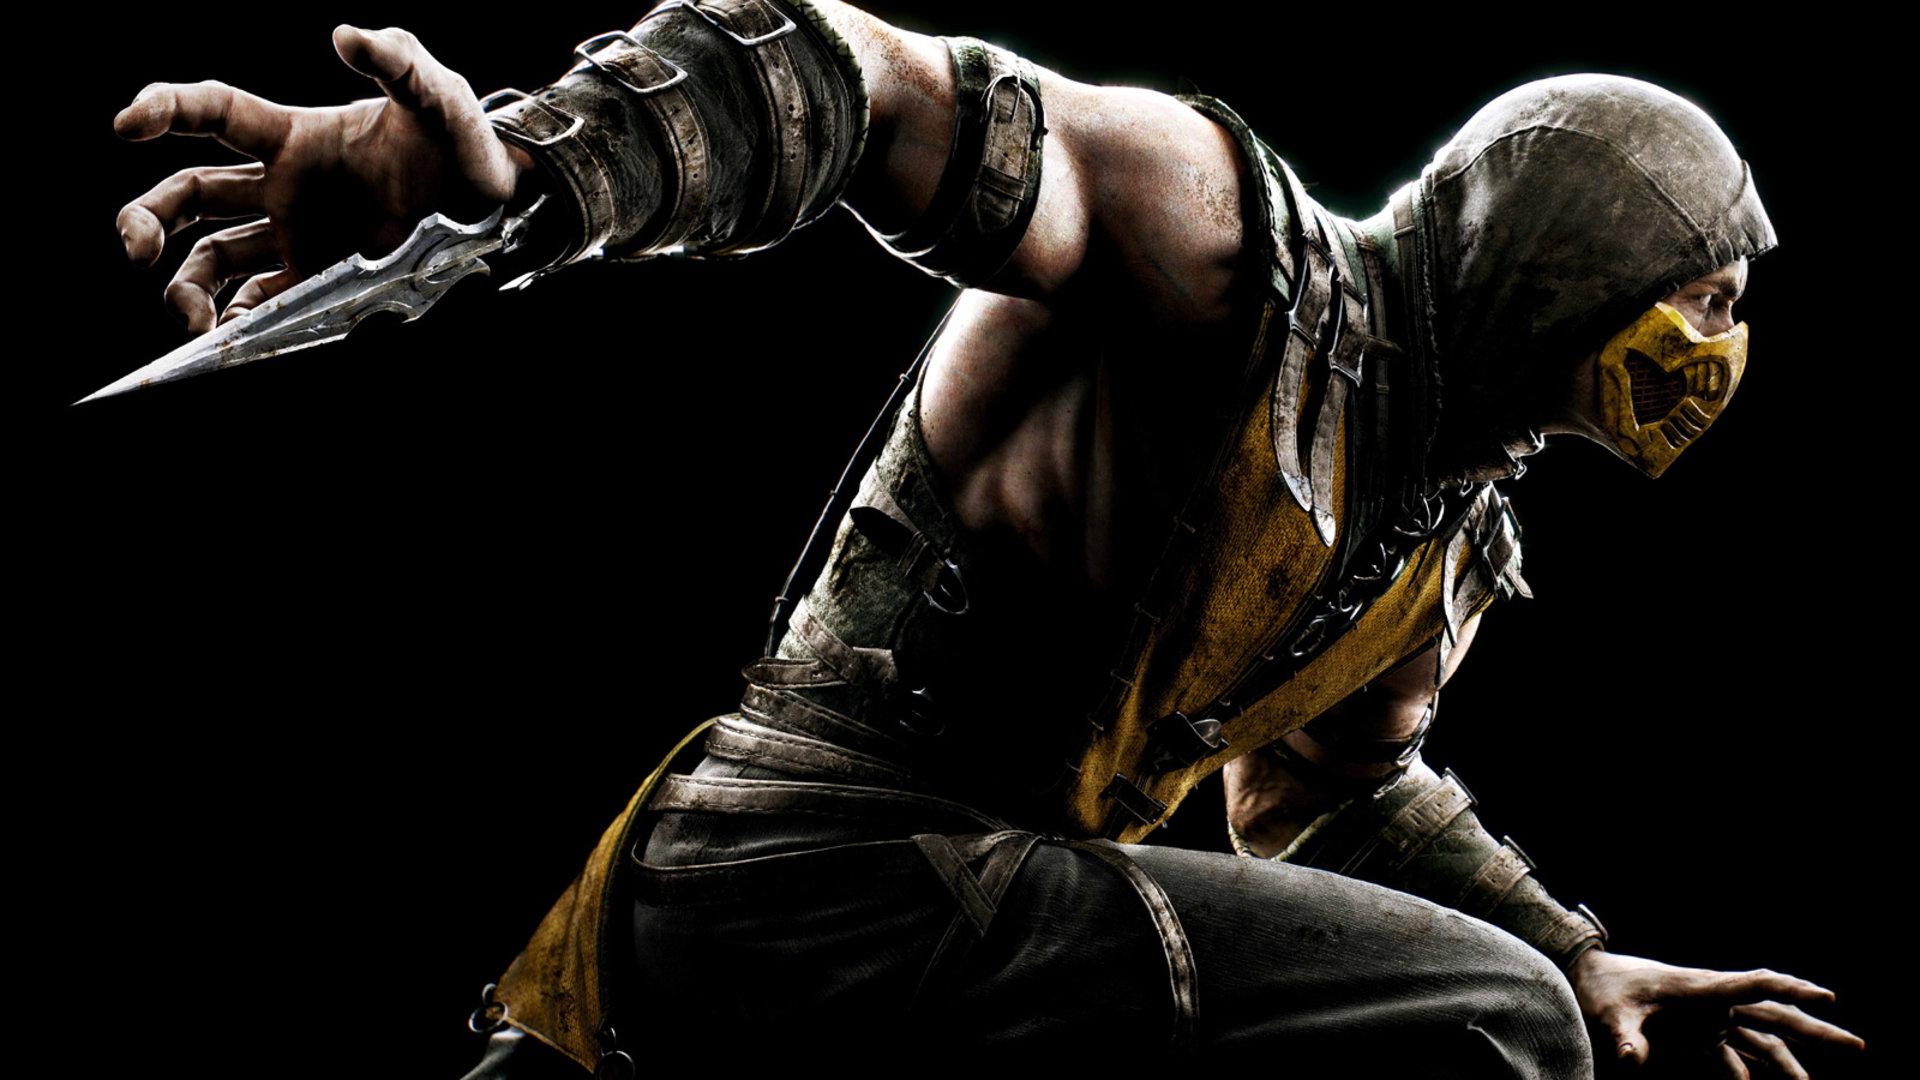 Mortal Kombat X wallpaper 2